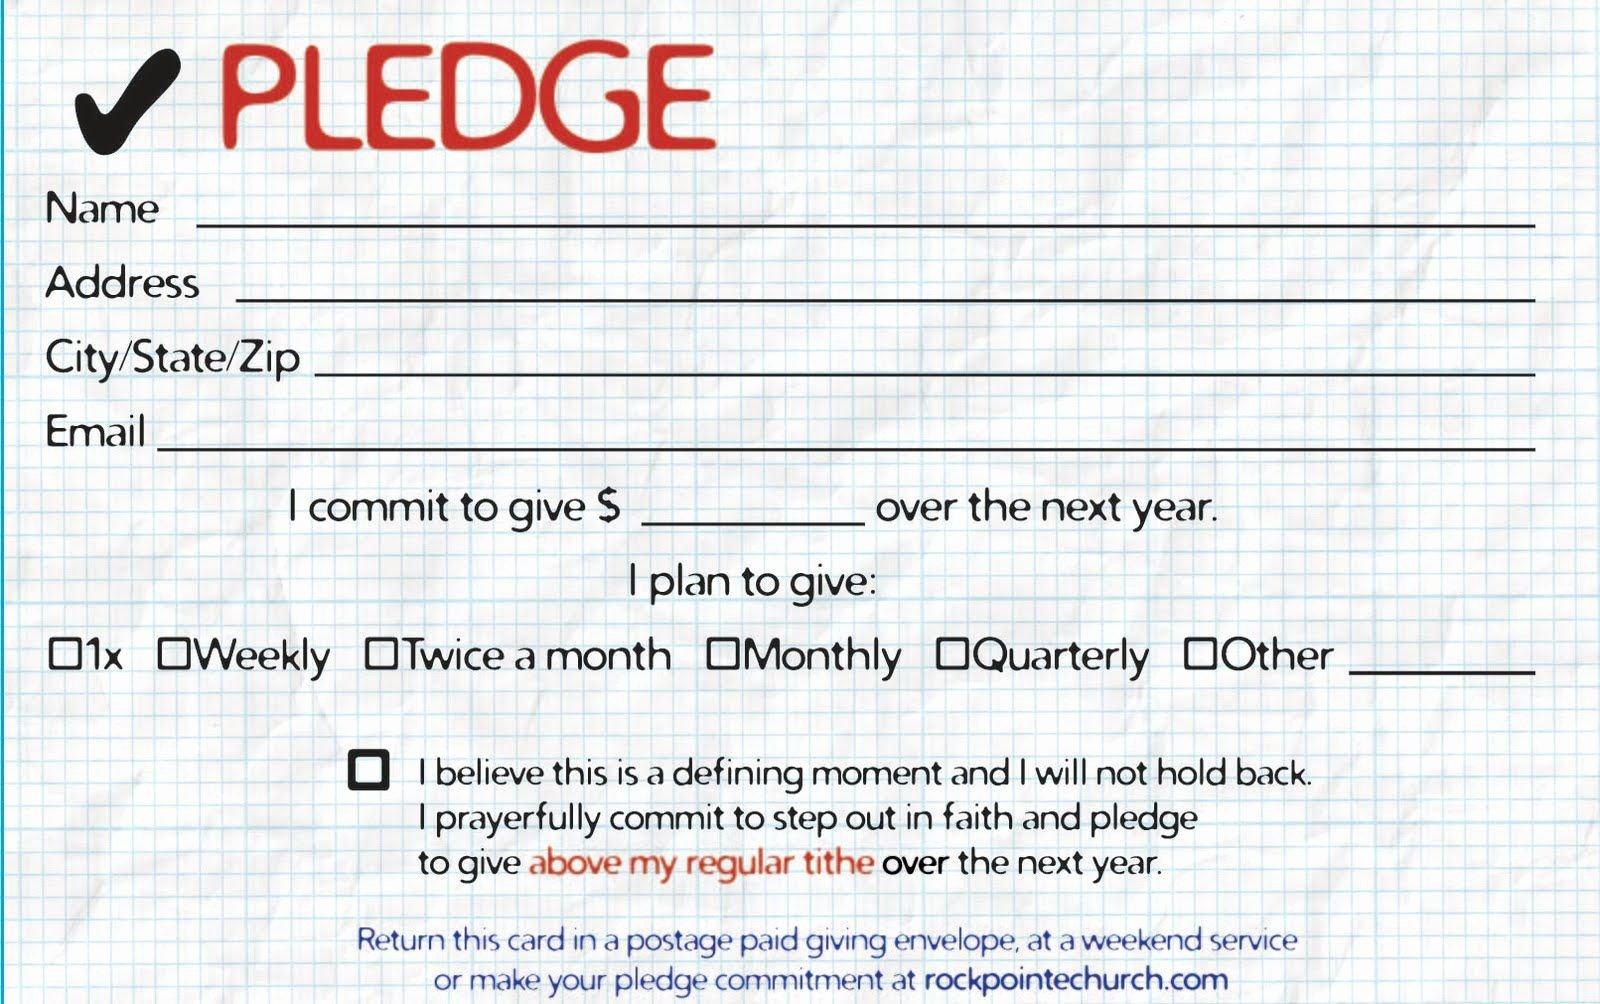 Donor Pledge Card Template Beautiful Pledge Cards for Churches Pledge Card Templates